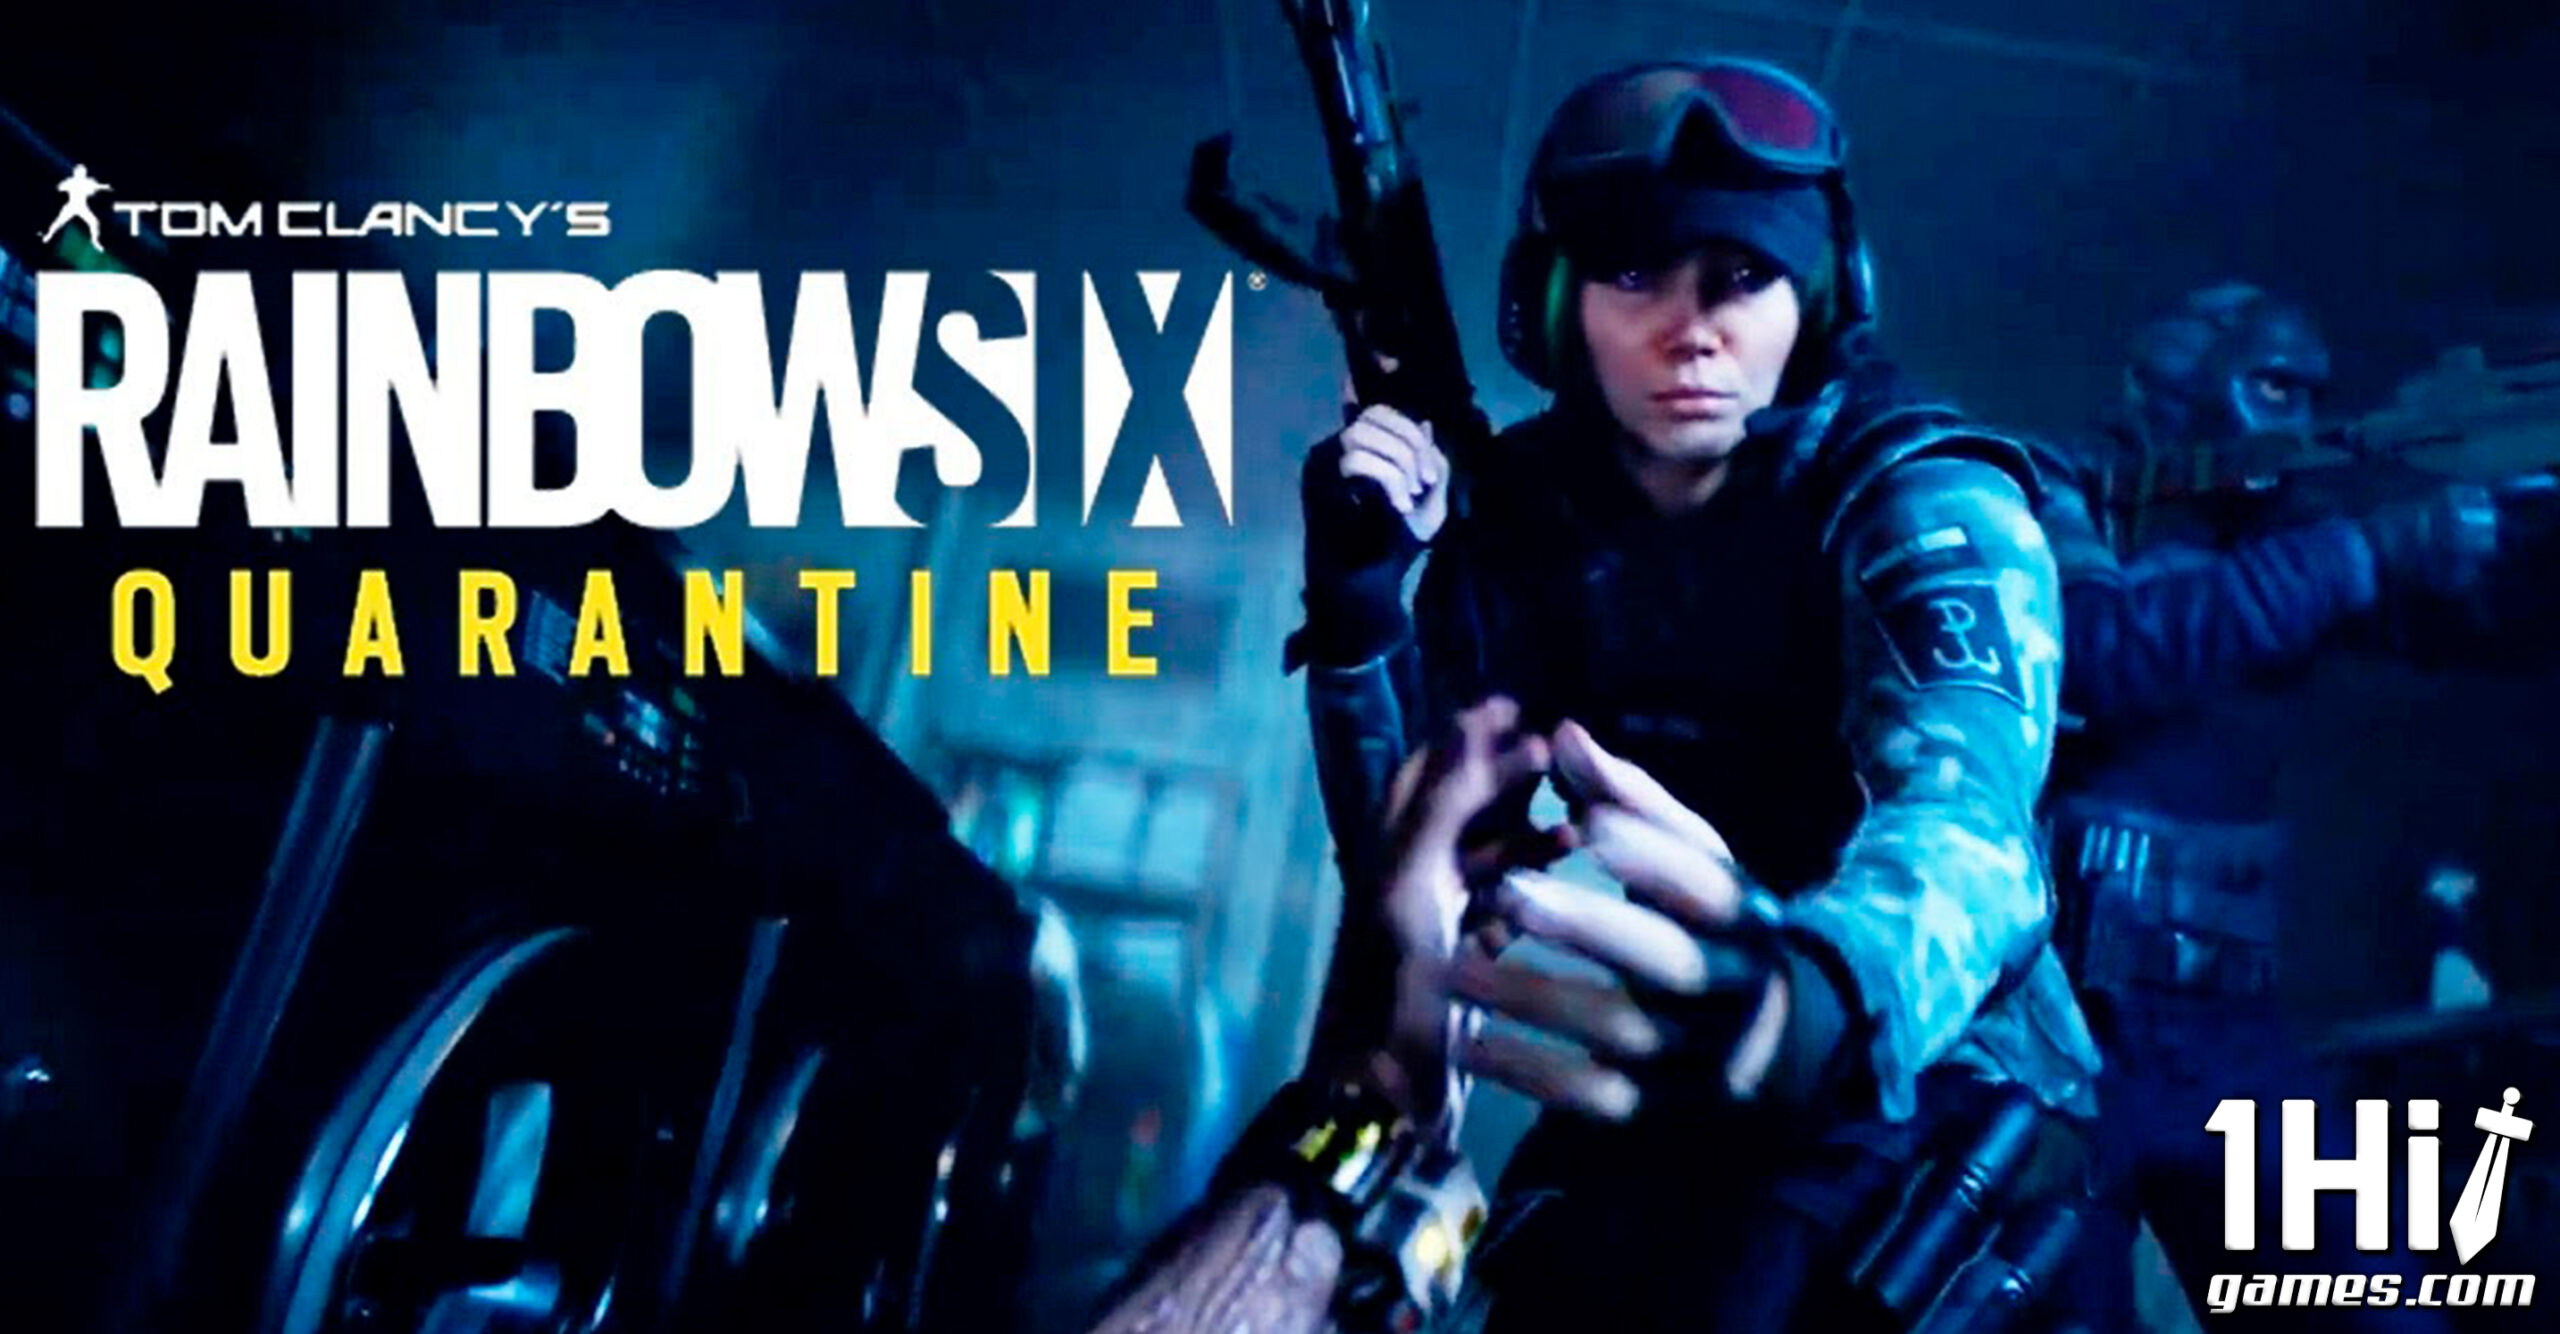 raibow six quarantine lançamento 1hit games